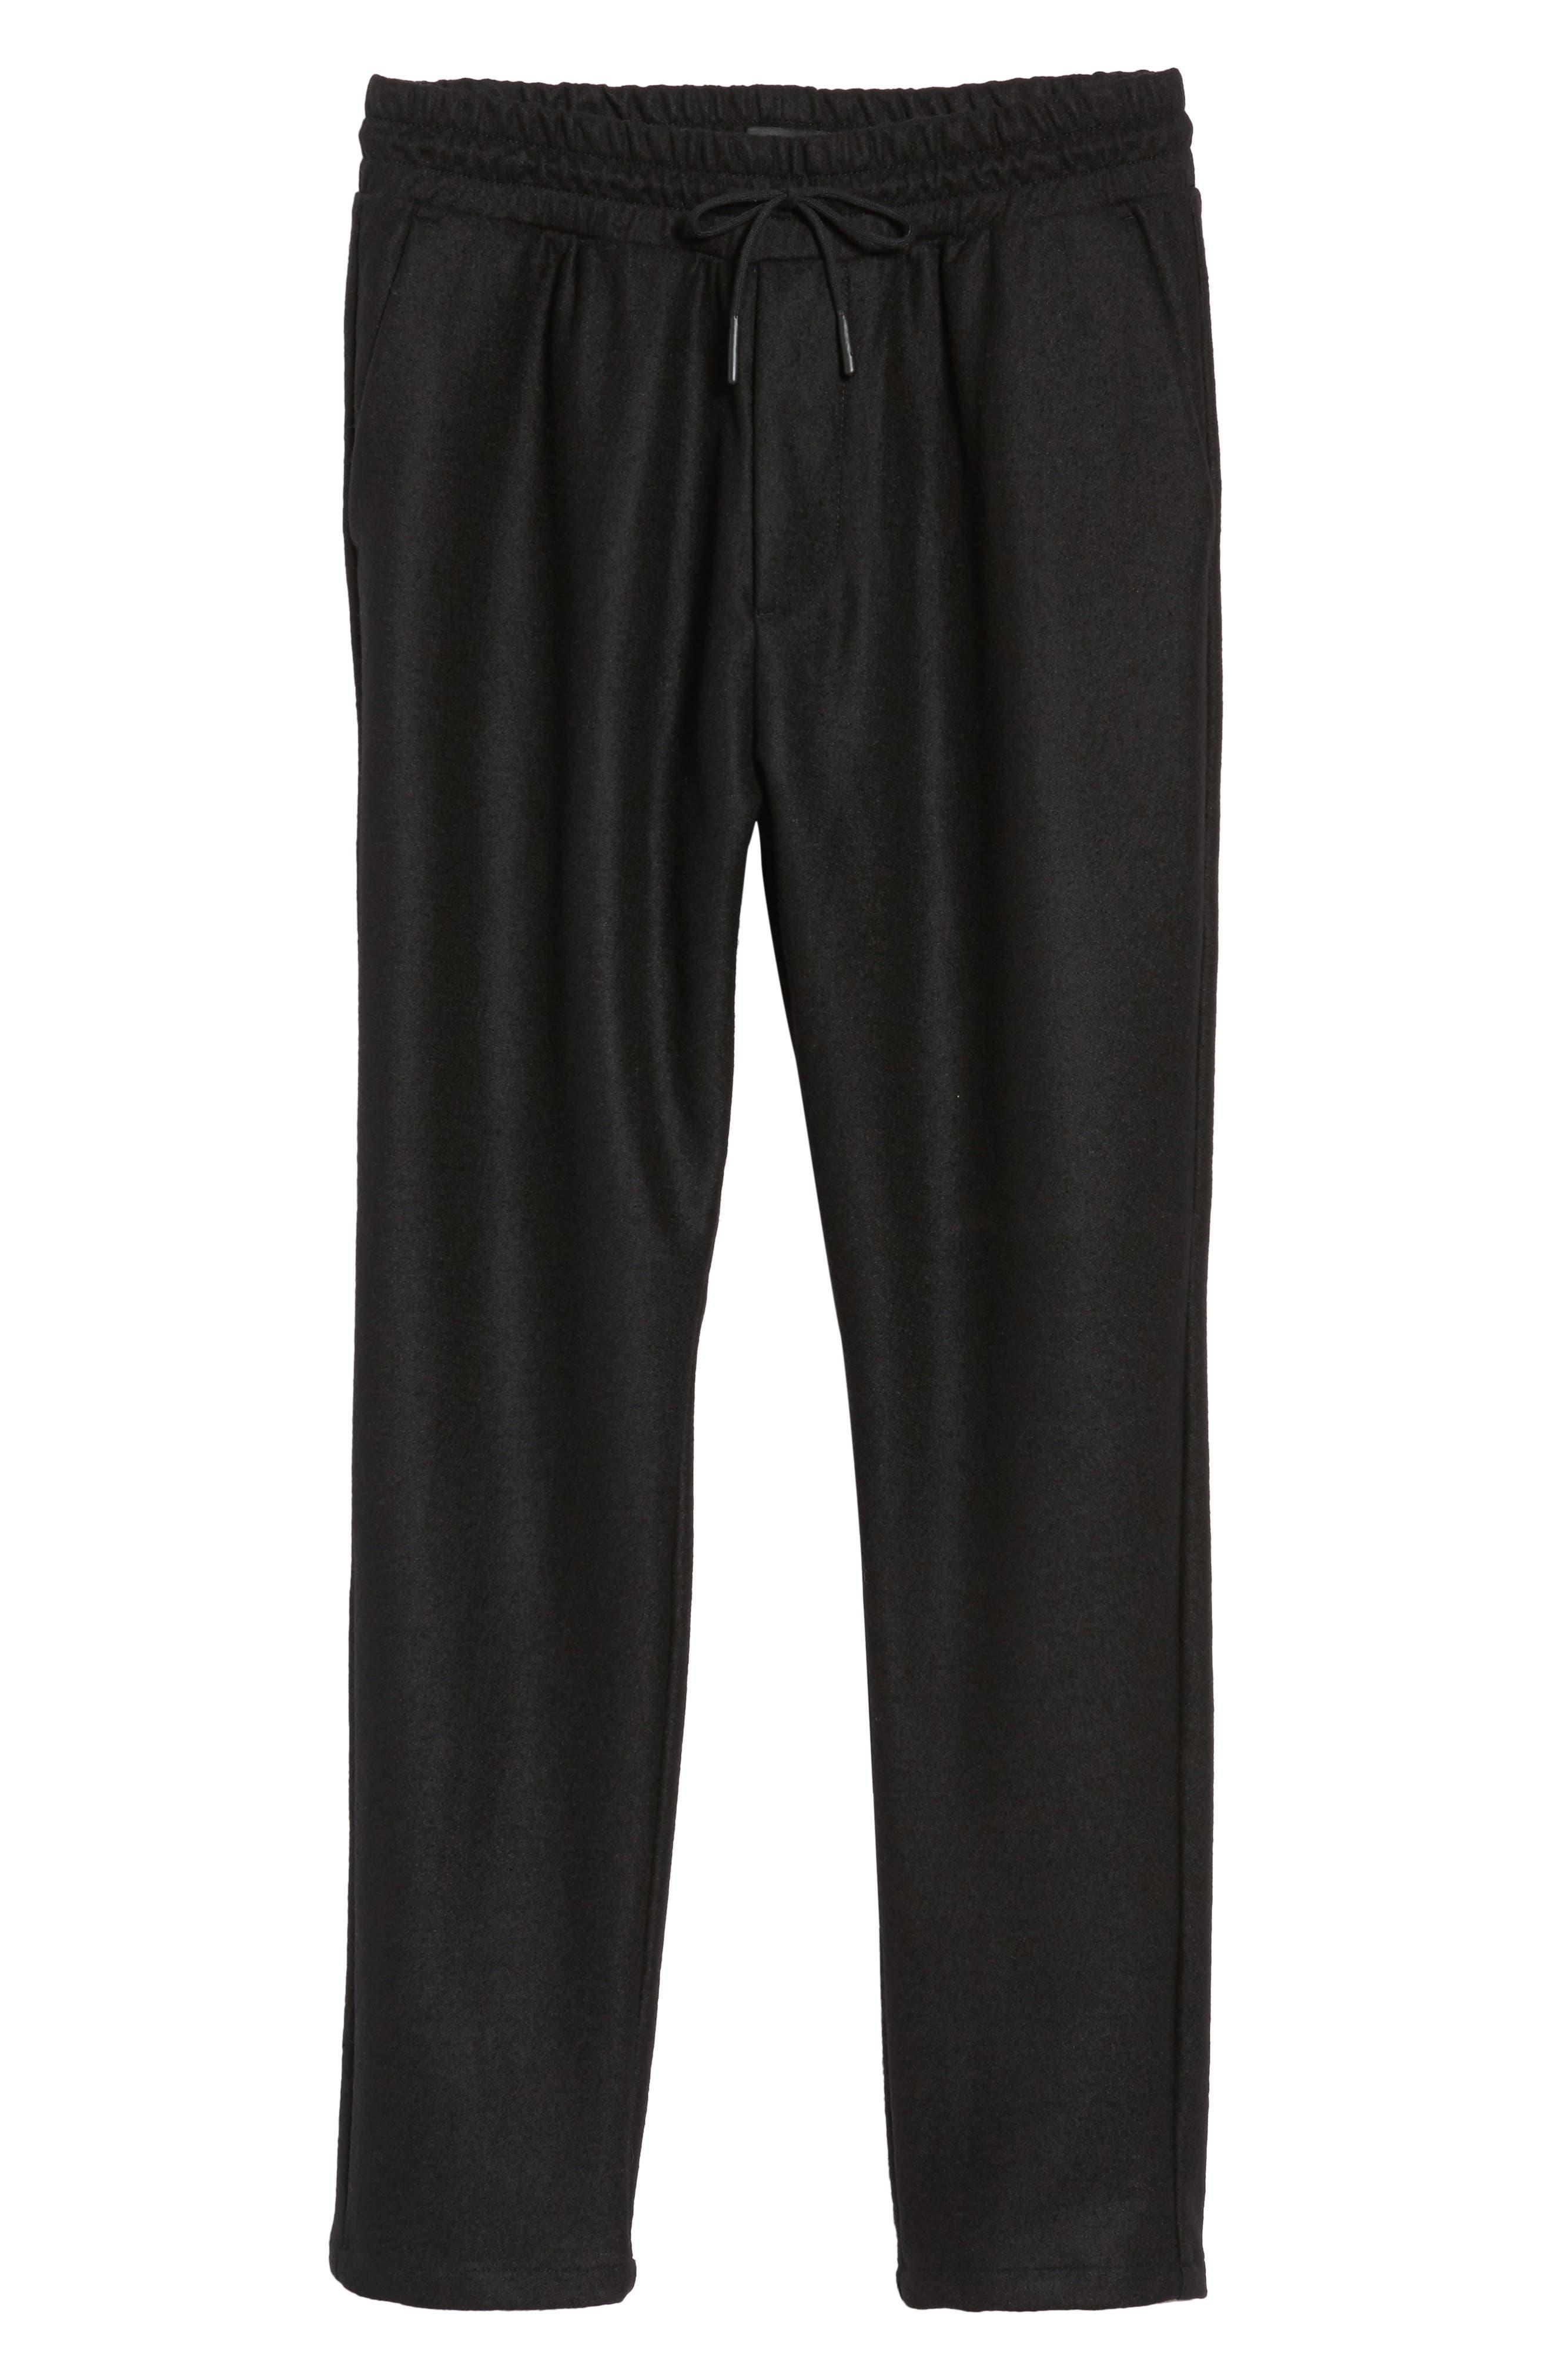 Drawstring Waist Pants,                             Alternate thumbnail 6, color,                             Black